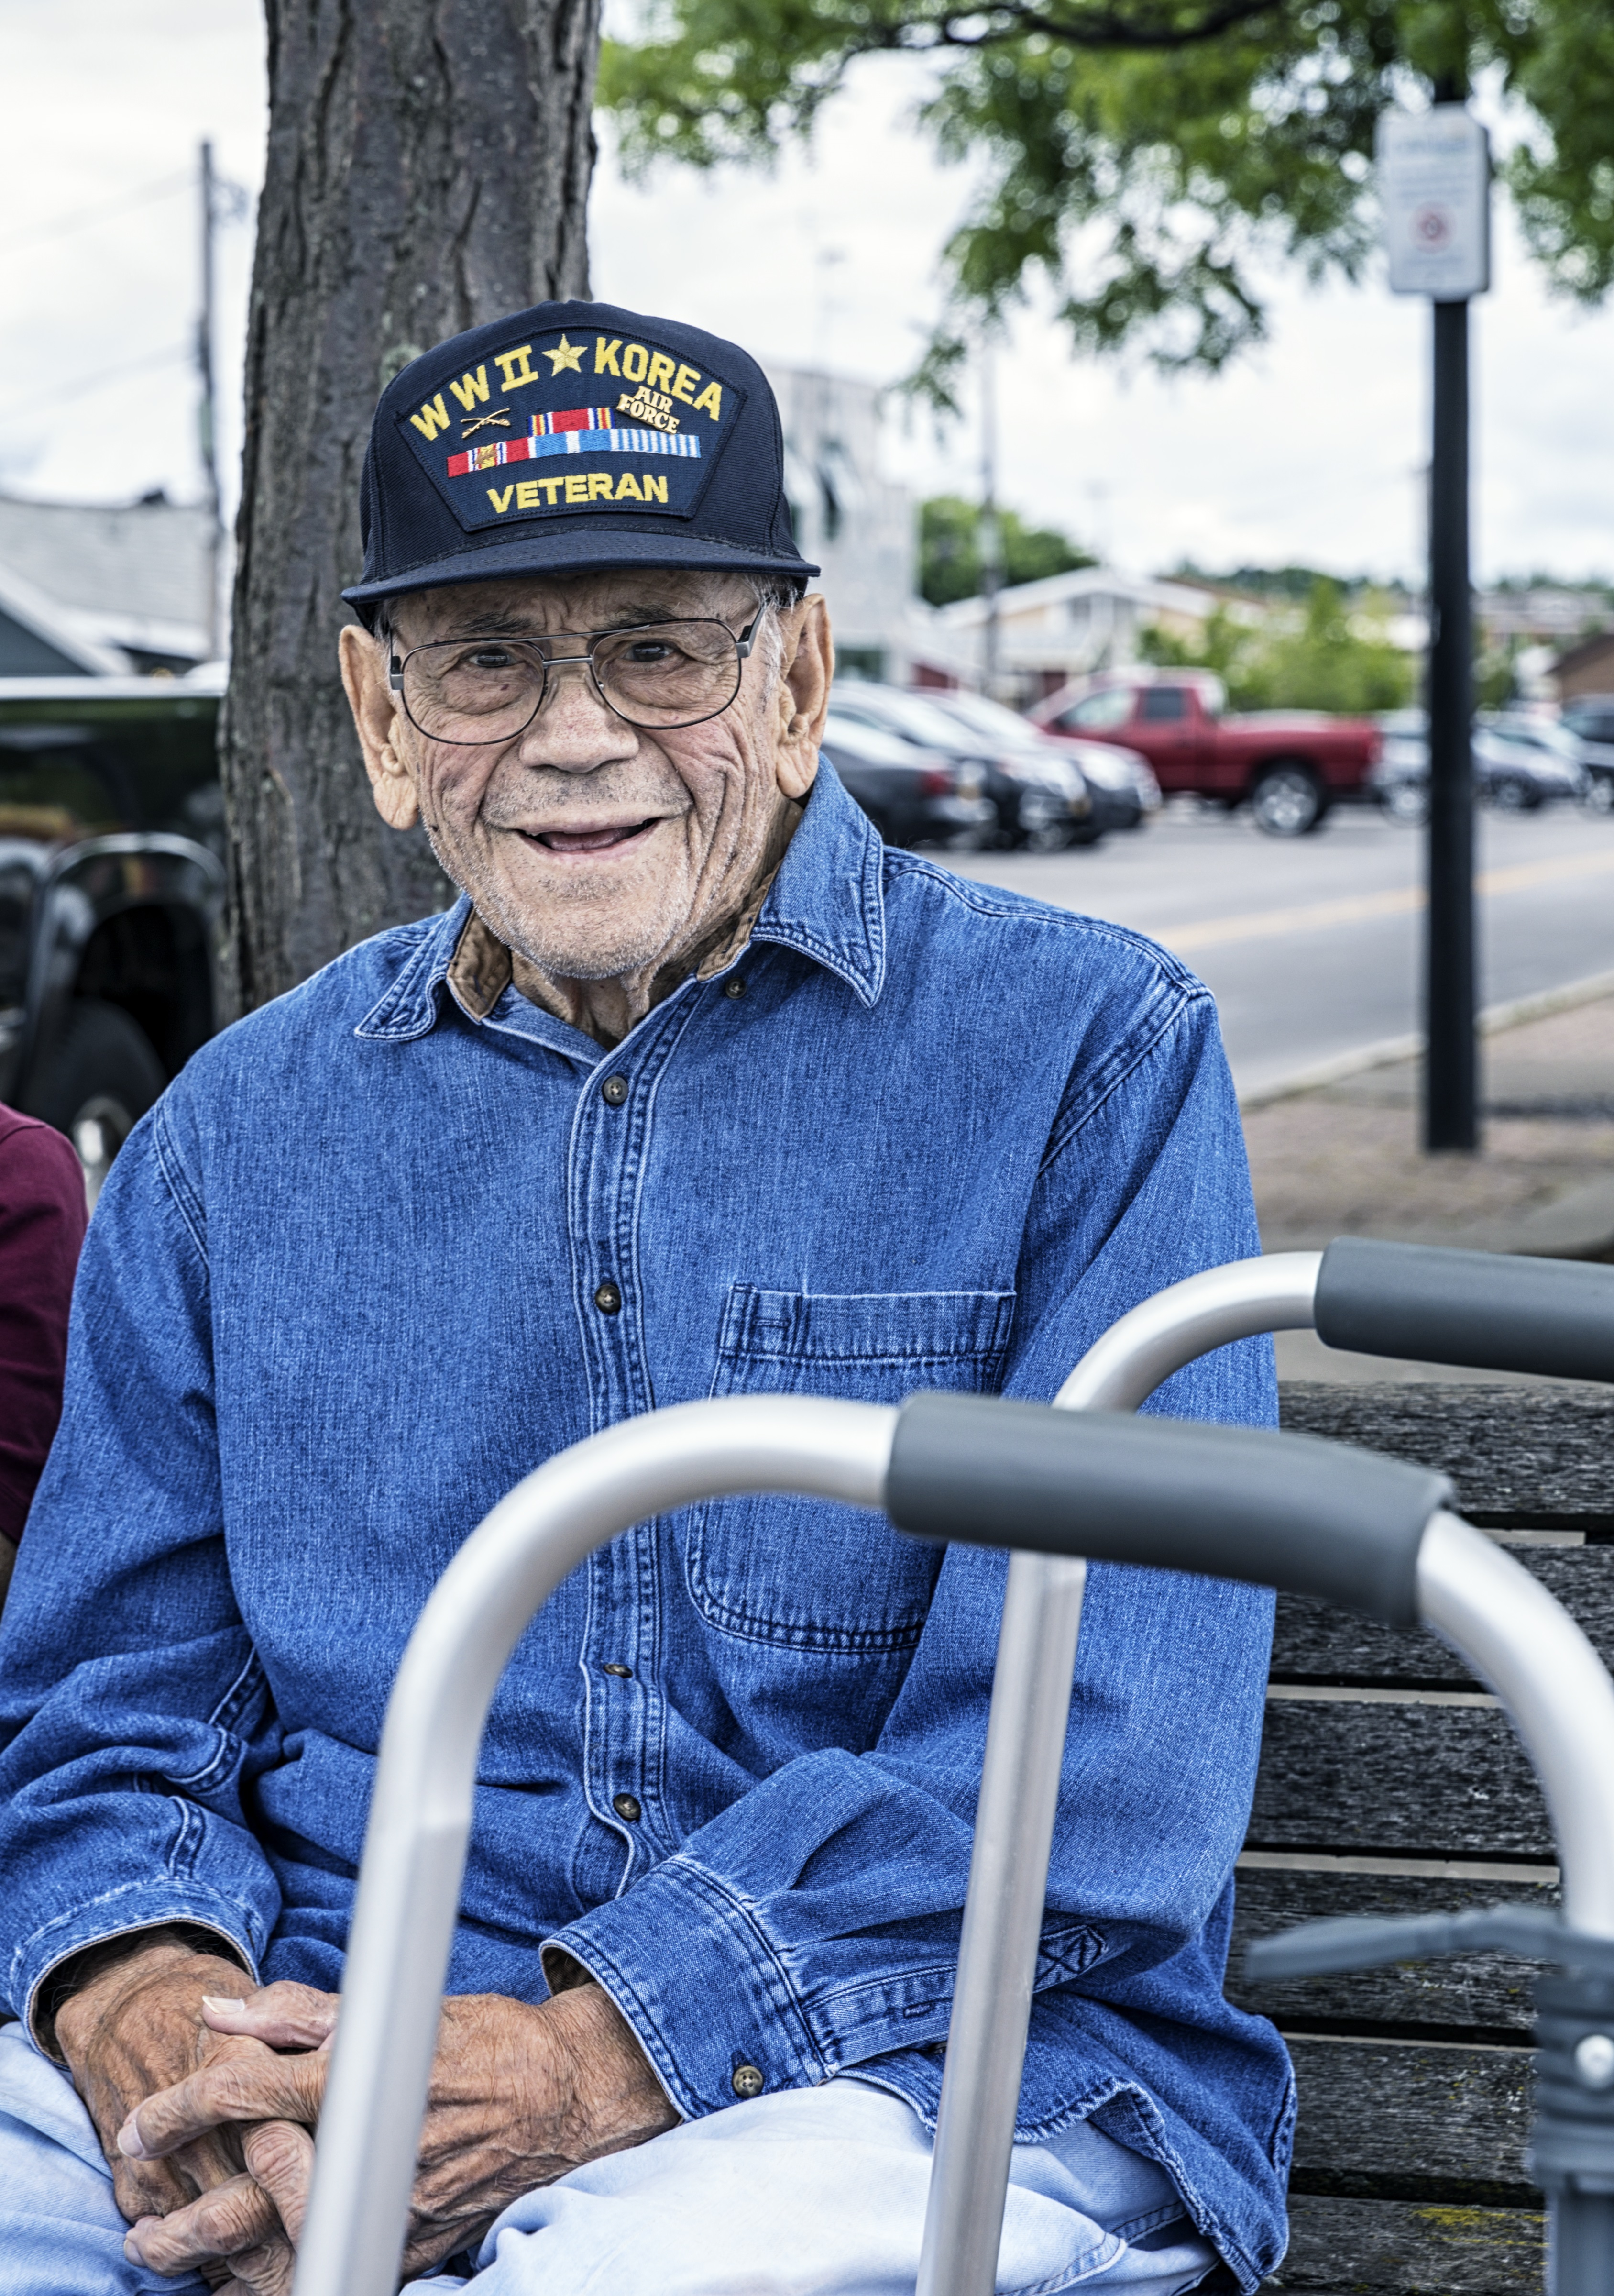 Smiling WWII and Korean War USA Military Veteran